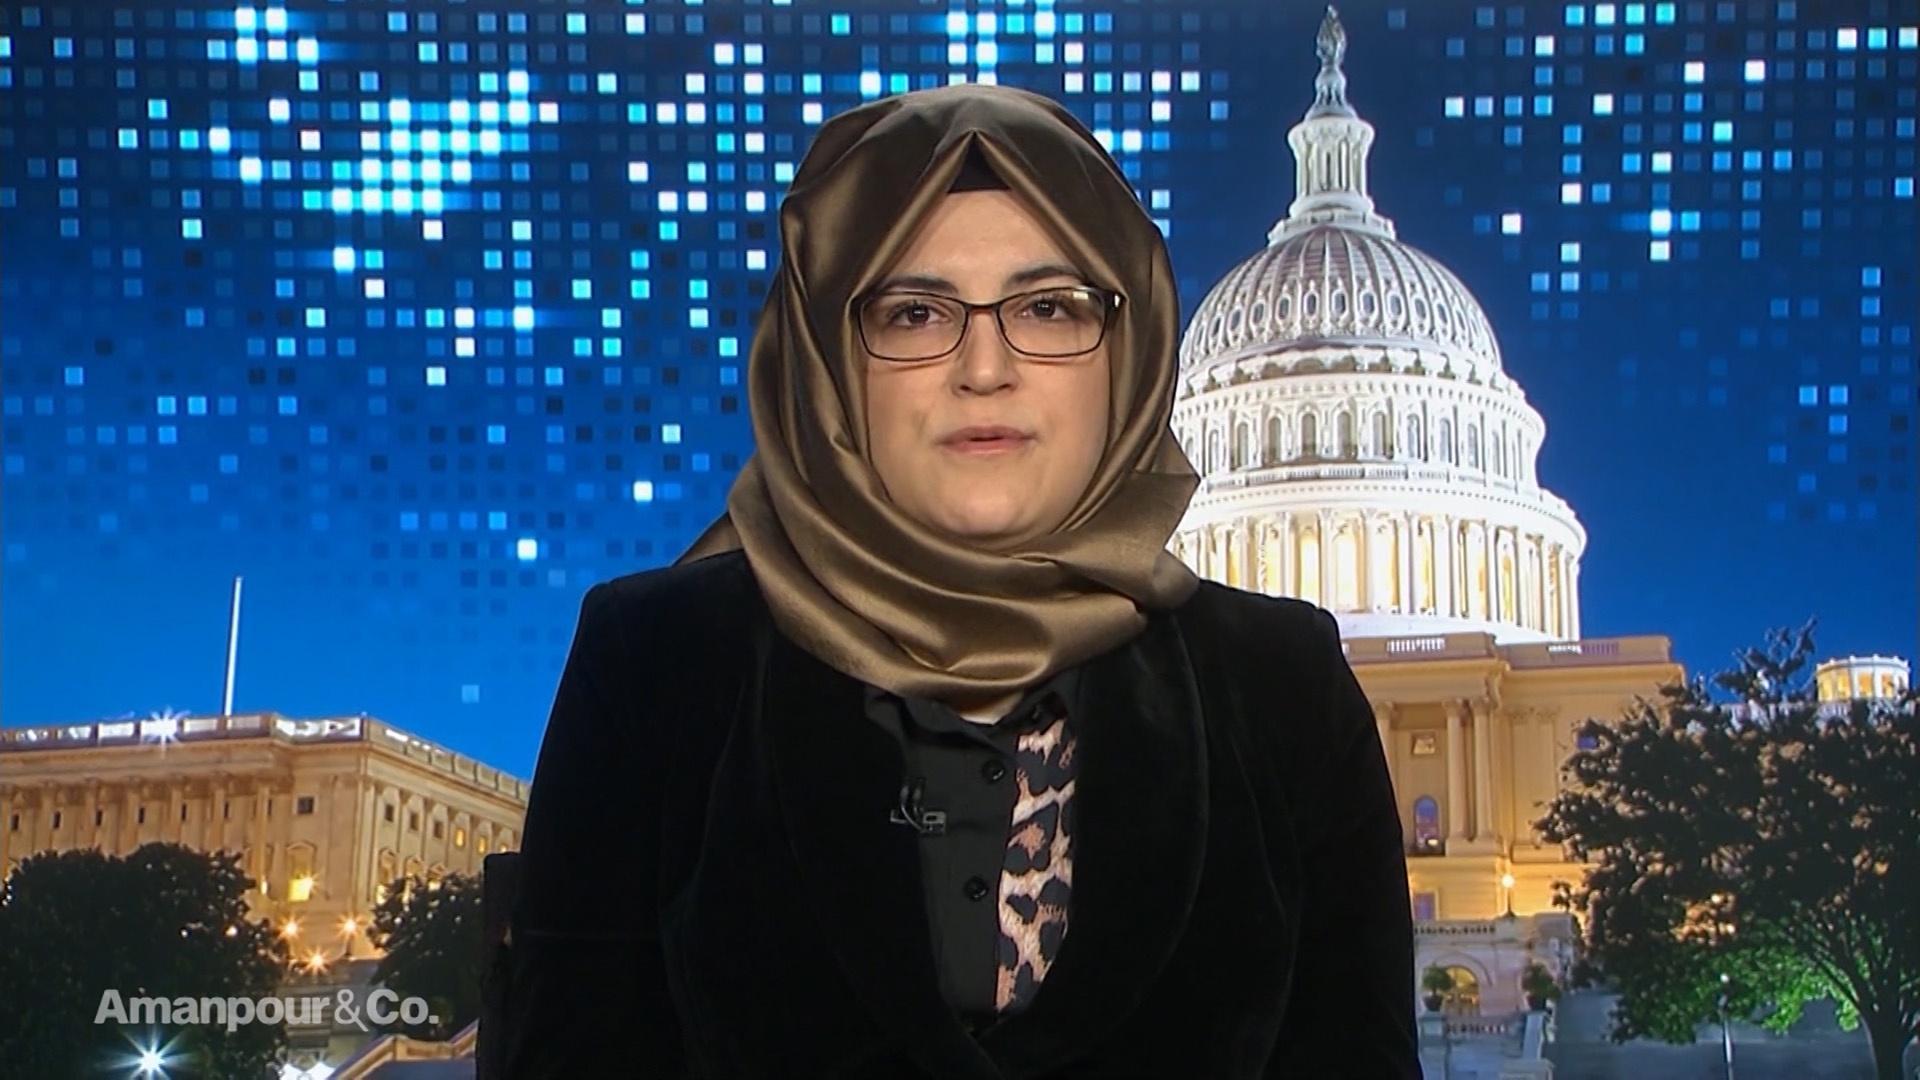 Hatice Cengiz, Jamal Khashoggi's Fiancée, on Justice